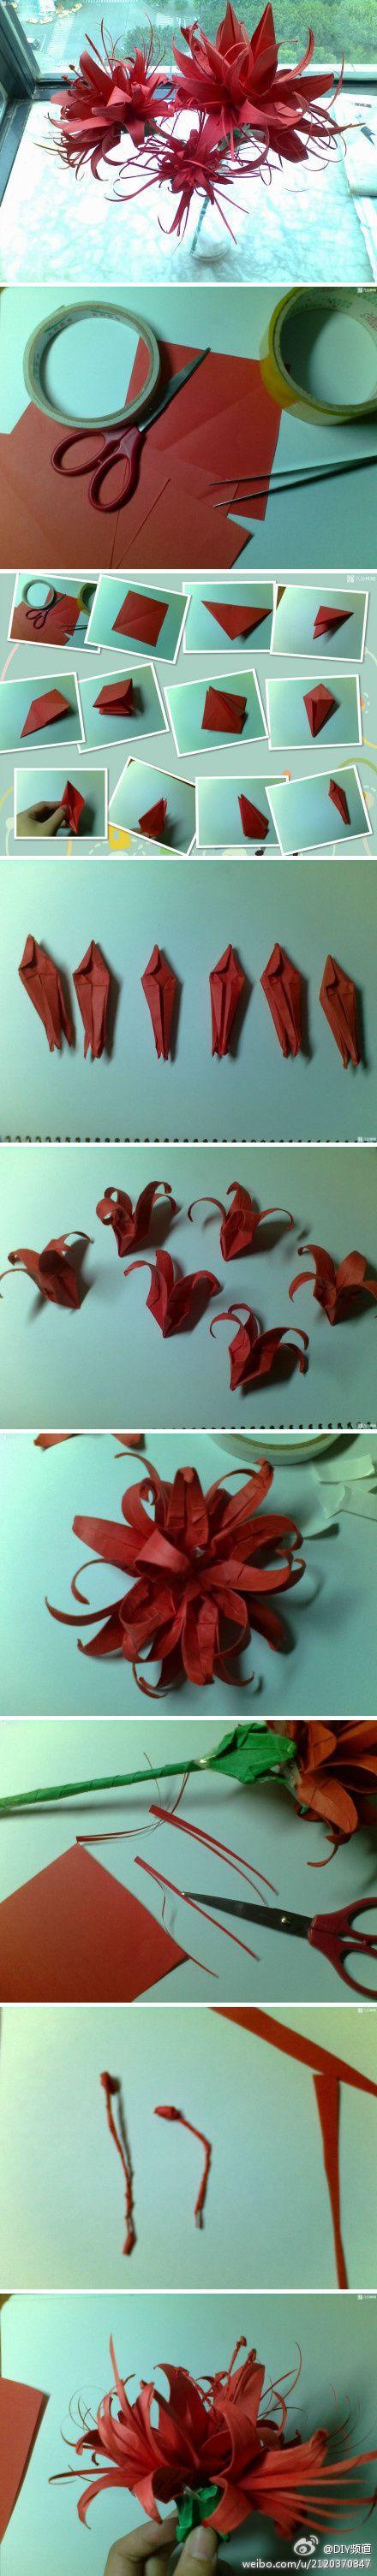 Flowers - Origami